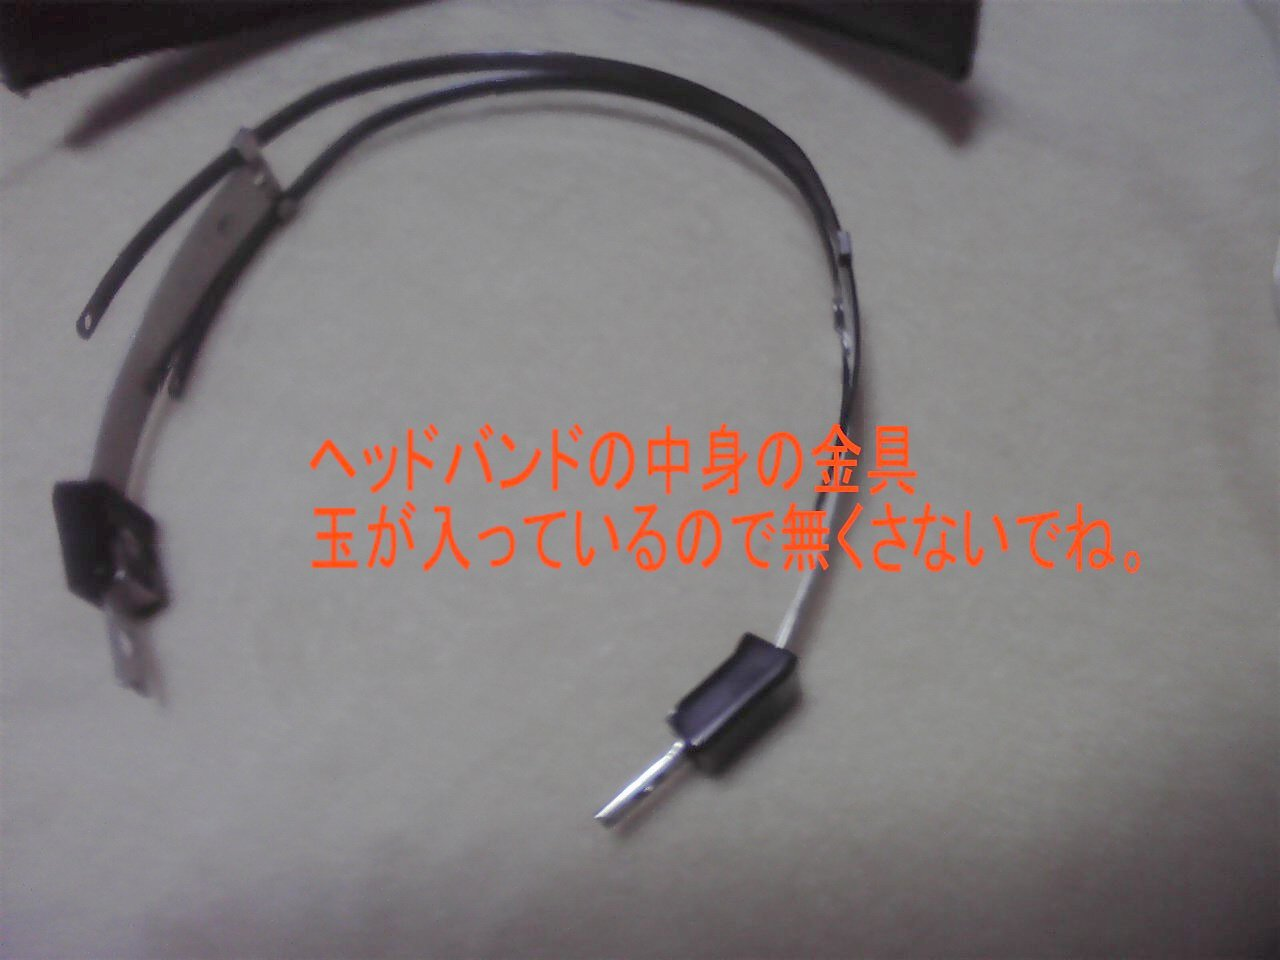 MDR-CD900ST R断線lリケーブル08